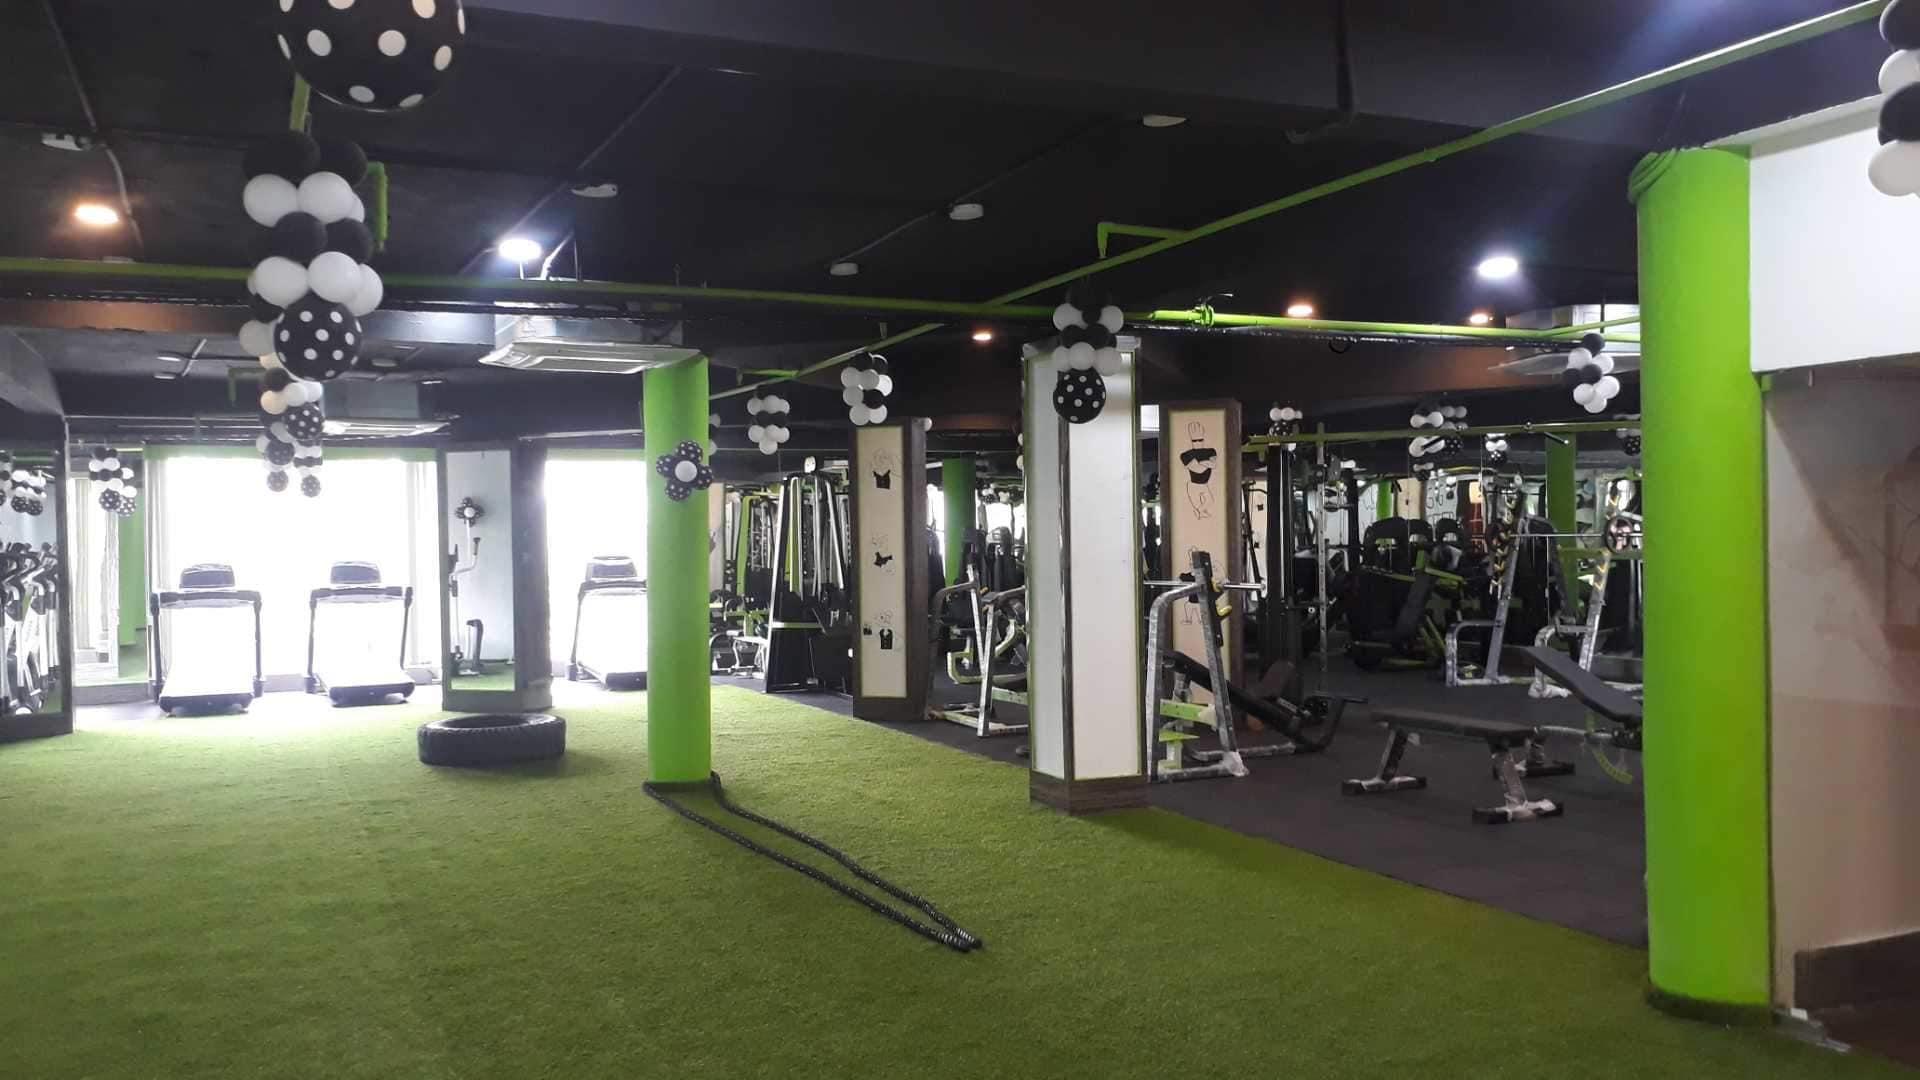 Top 50 Gyms in Vijay Nagar - Best Body Building & Fitness Centres